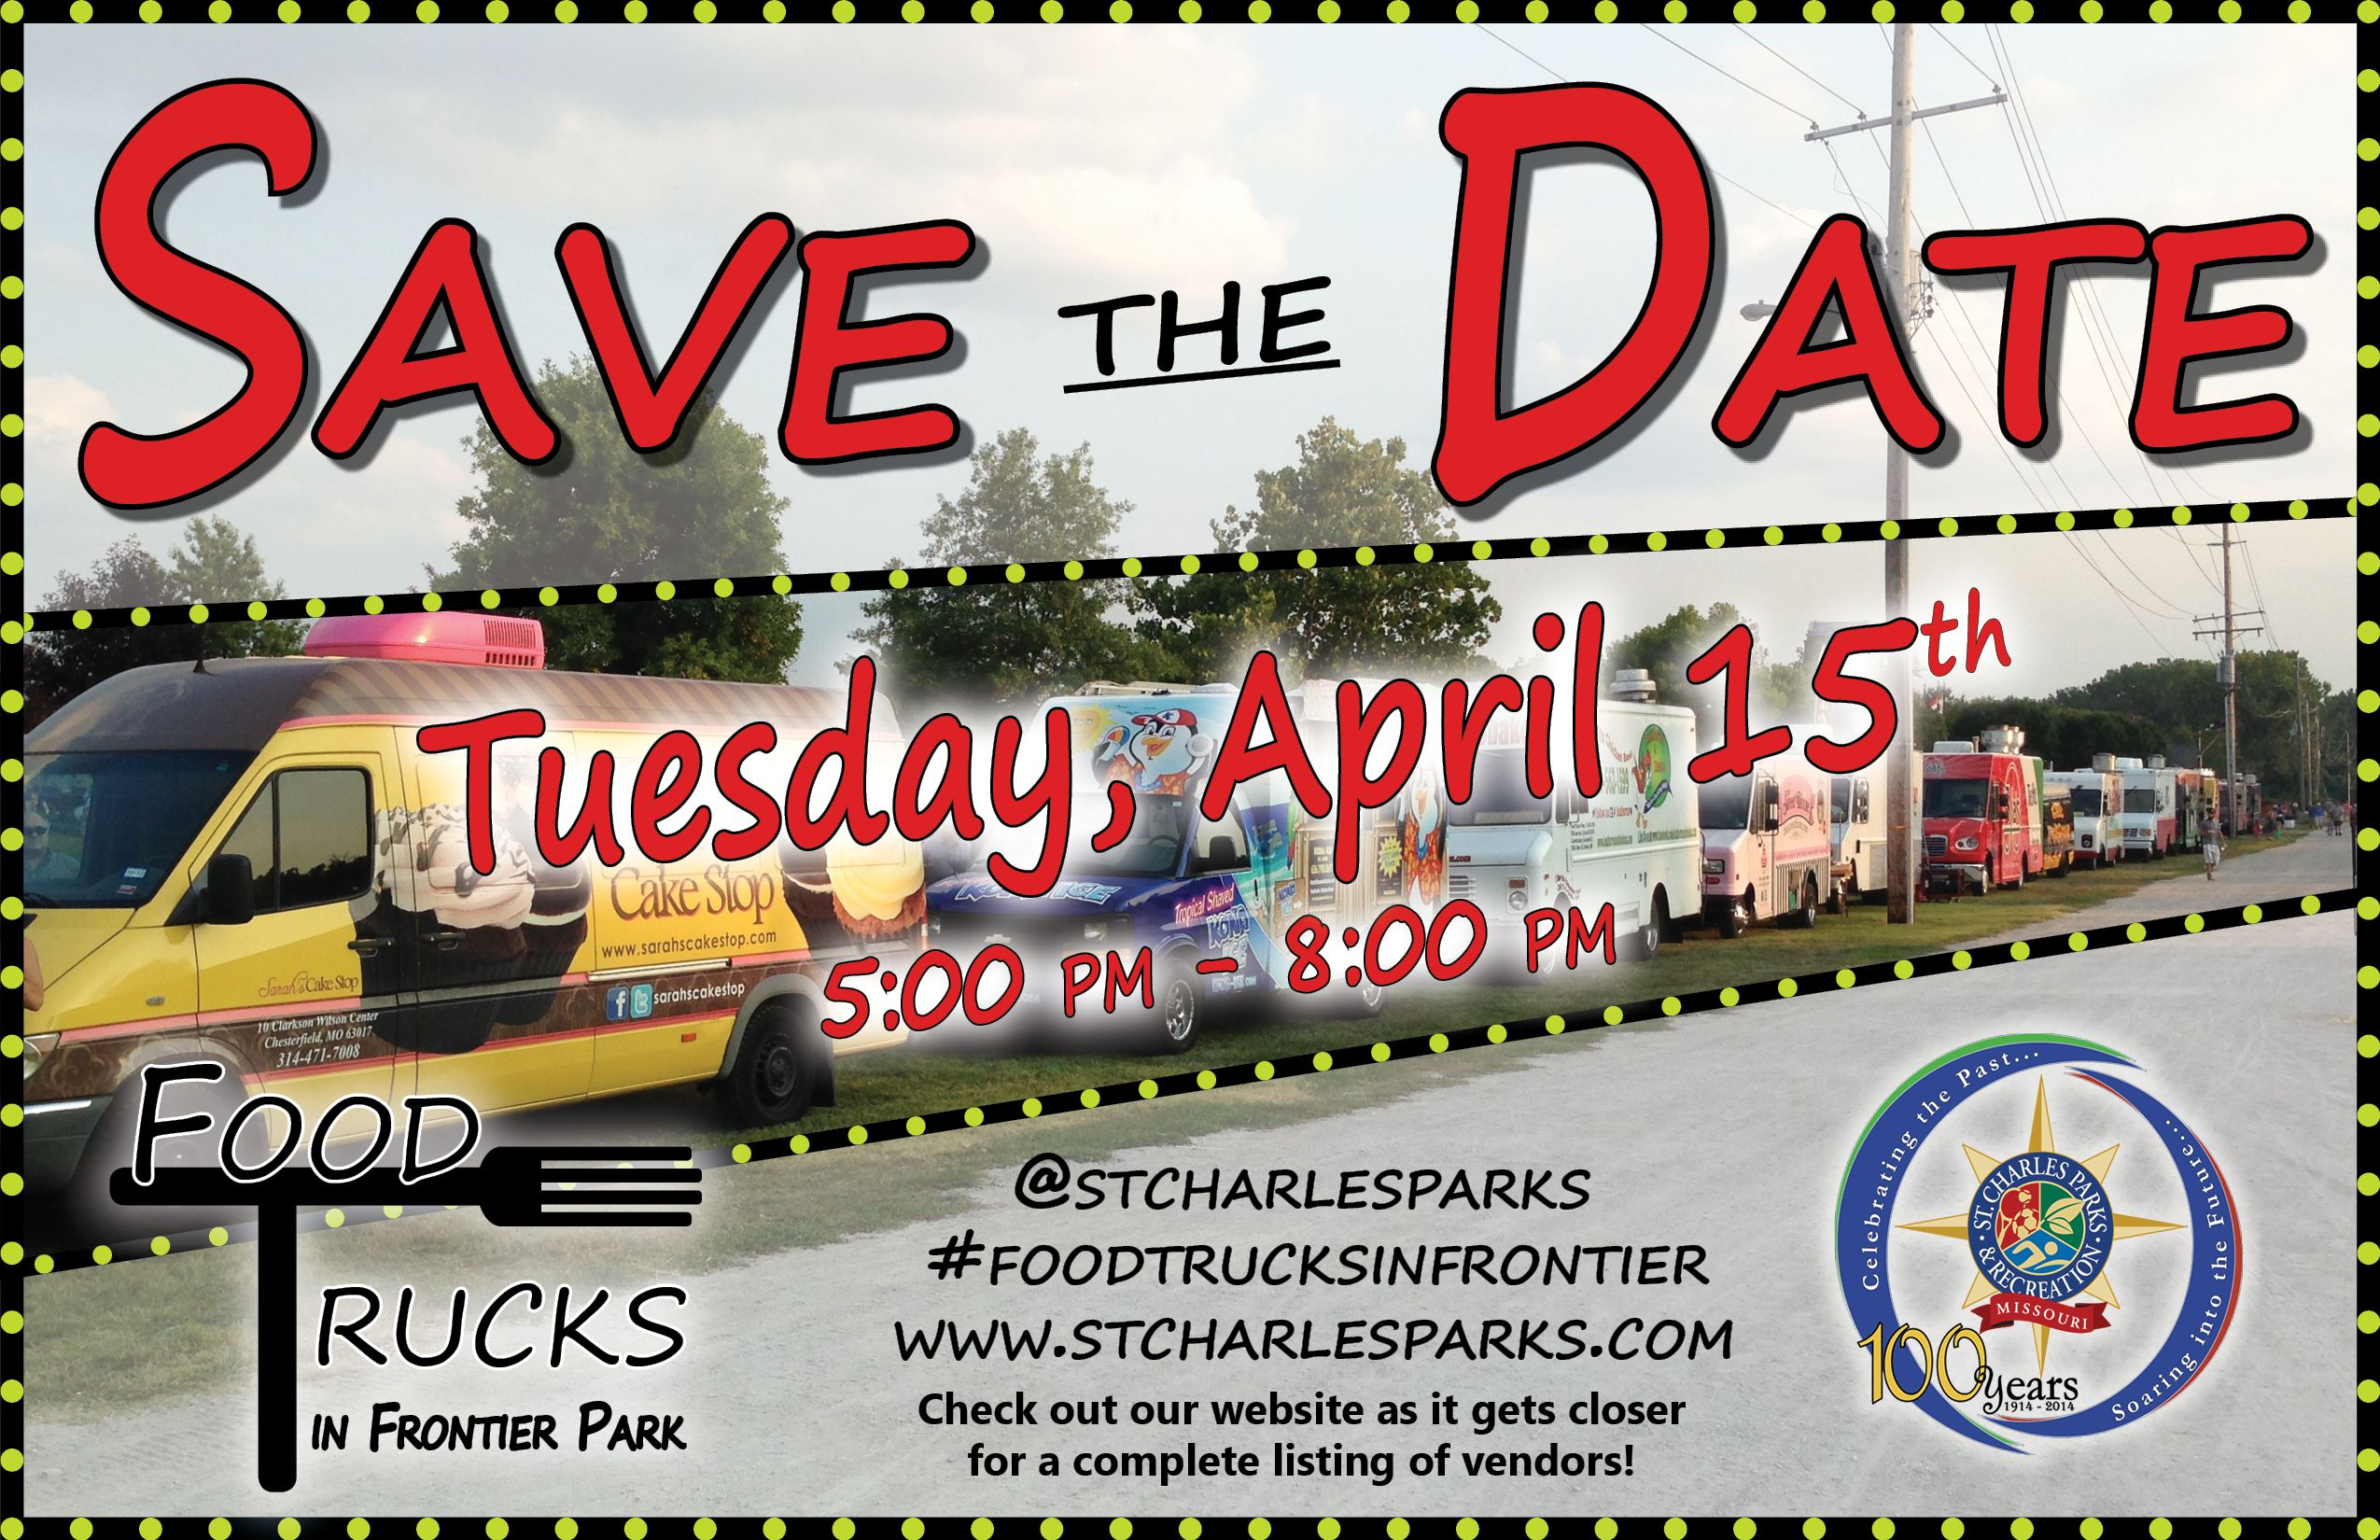 Cheap Six Flags Tickets Http Cheapthemeparks Com Six Flags Discount Tickets Frontier Park April 15